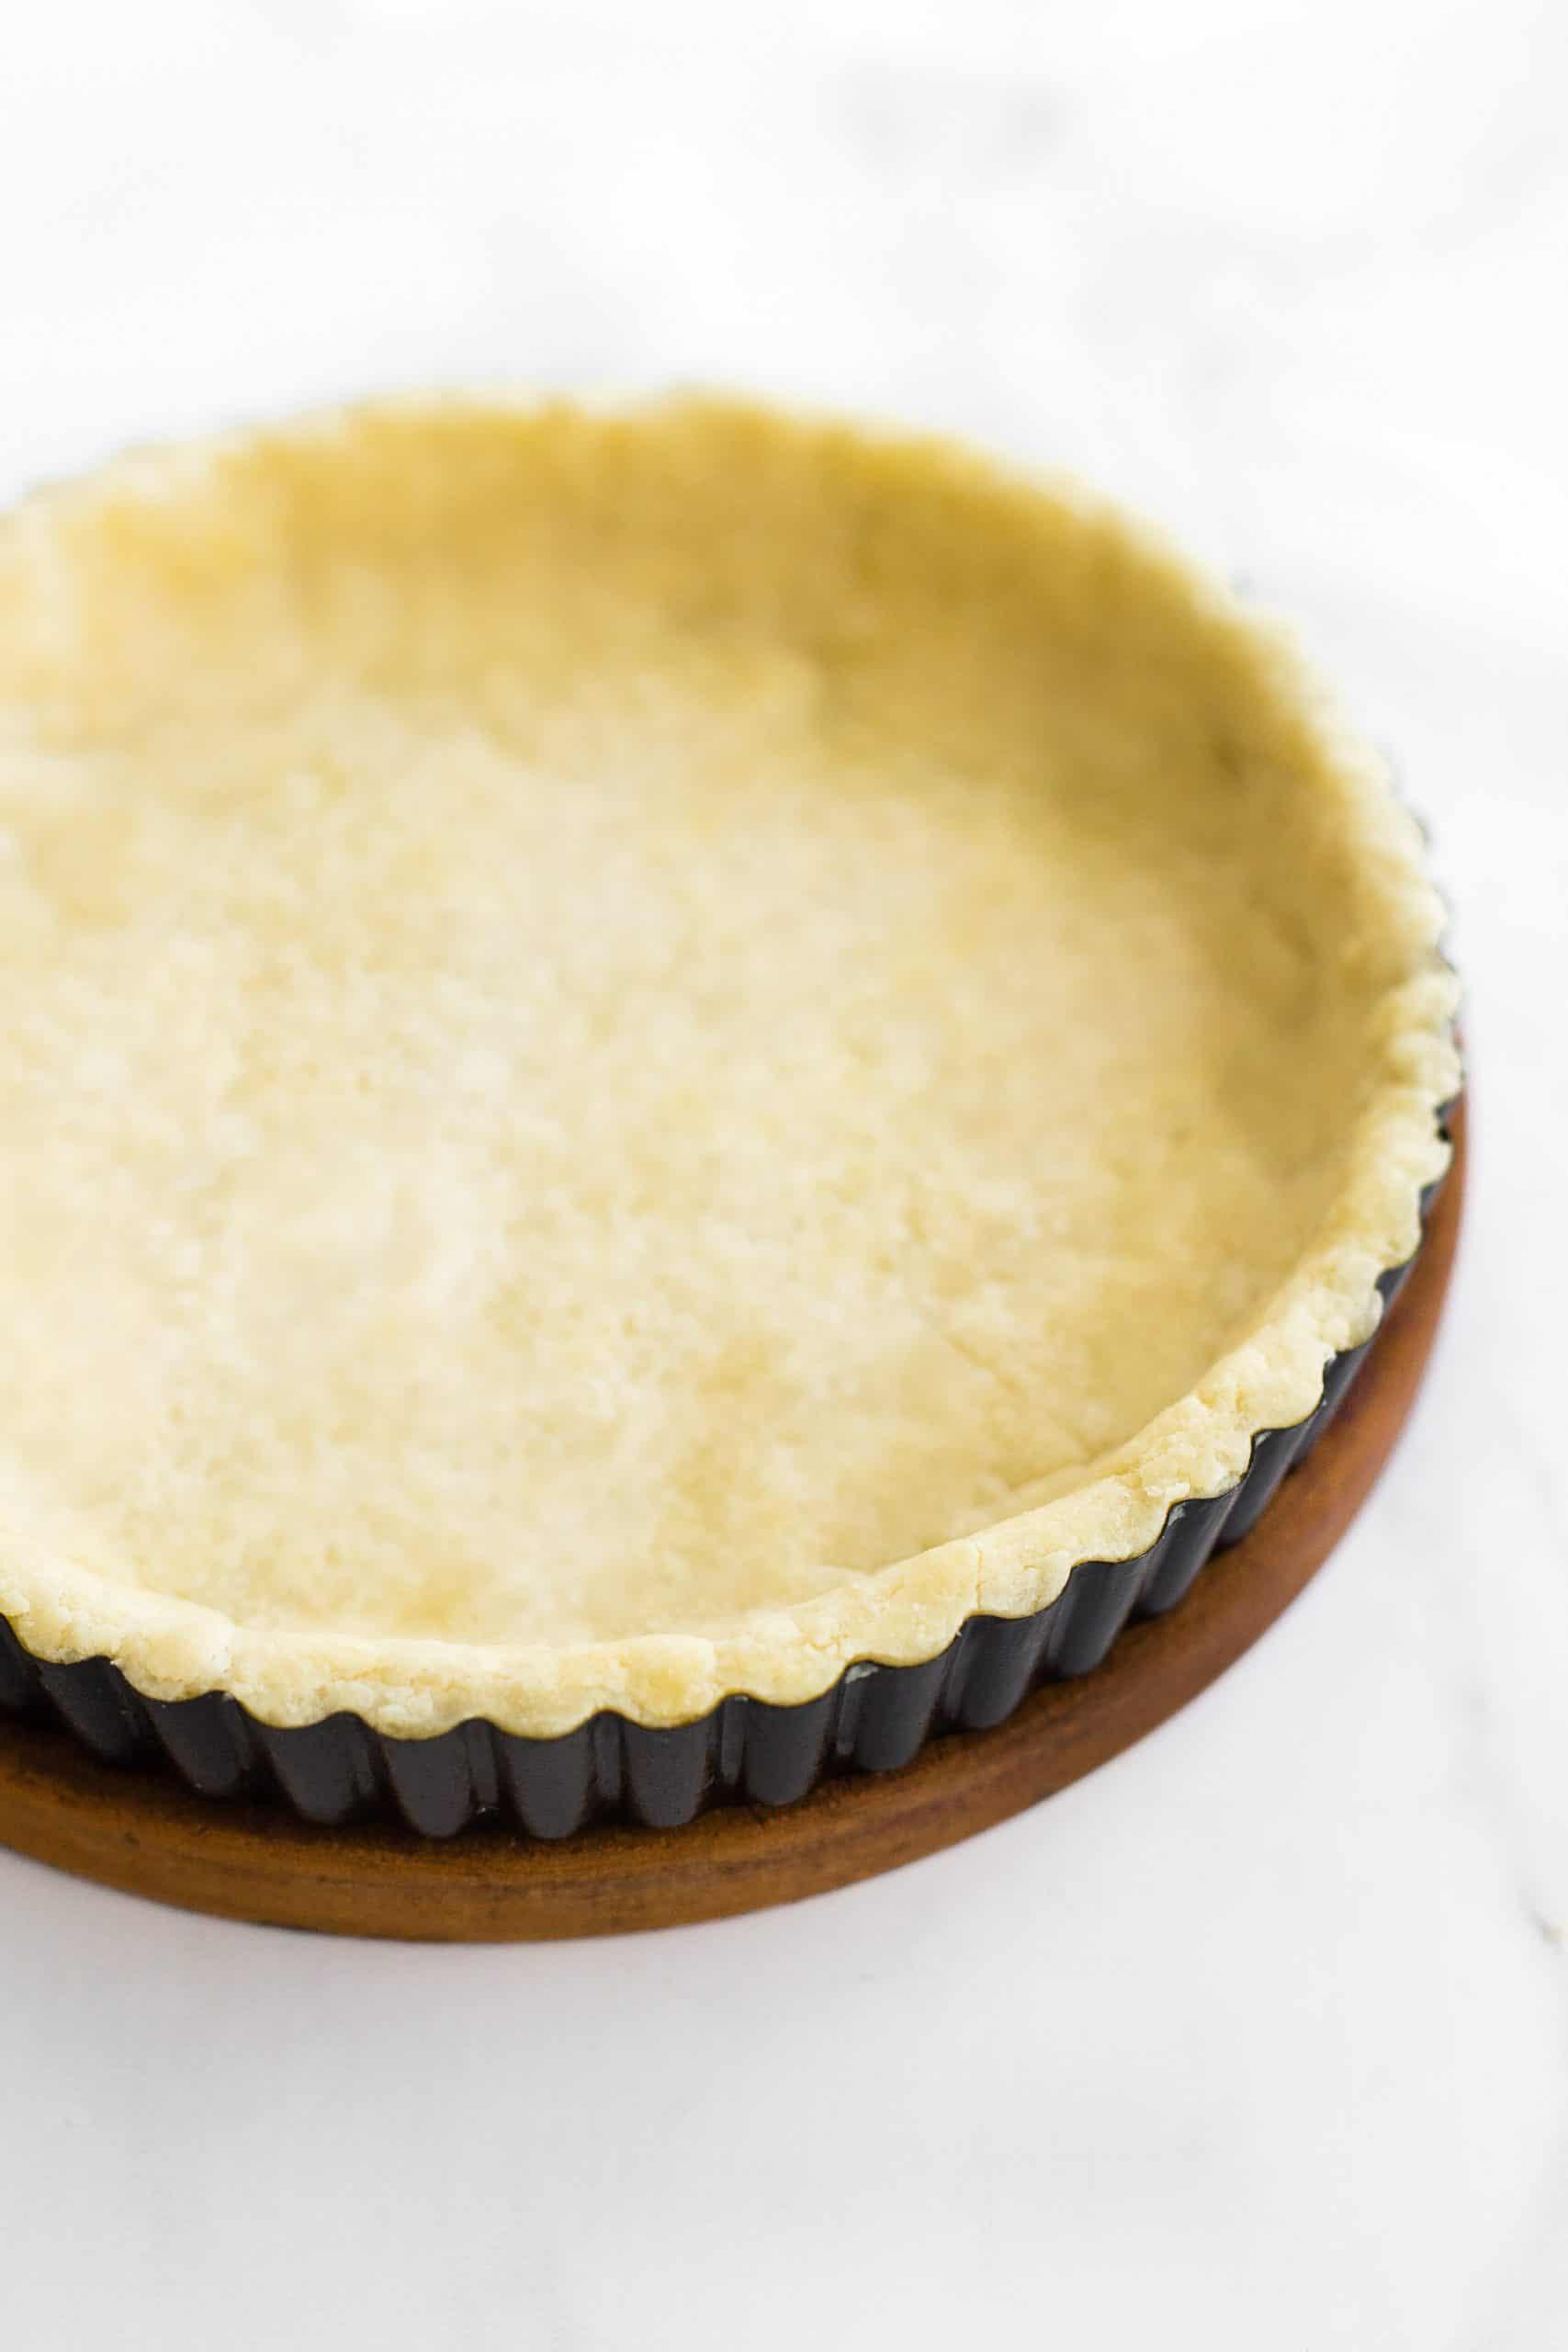 Par-baked pie crust in a pie tin on a wooden board.